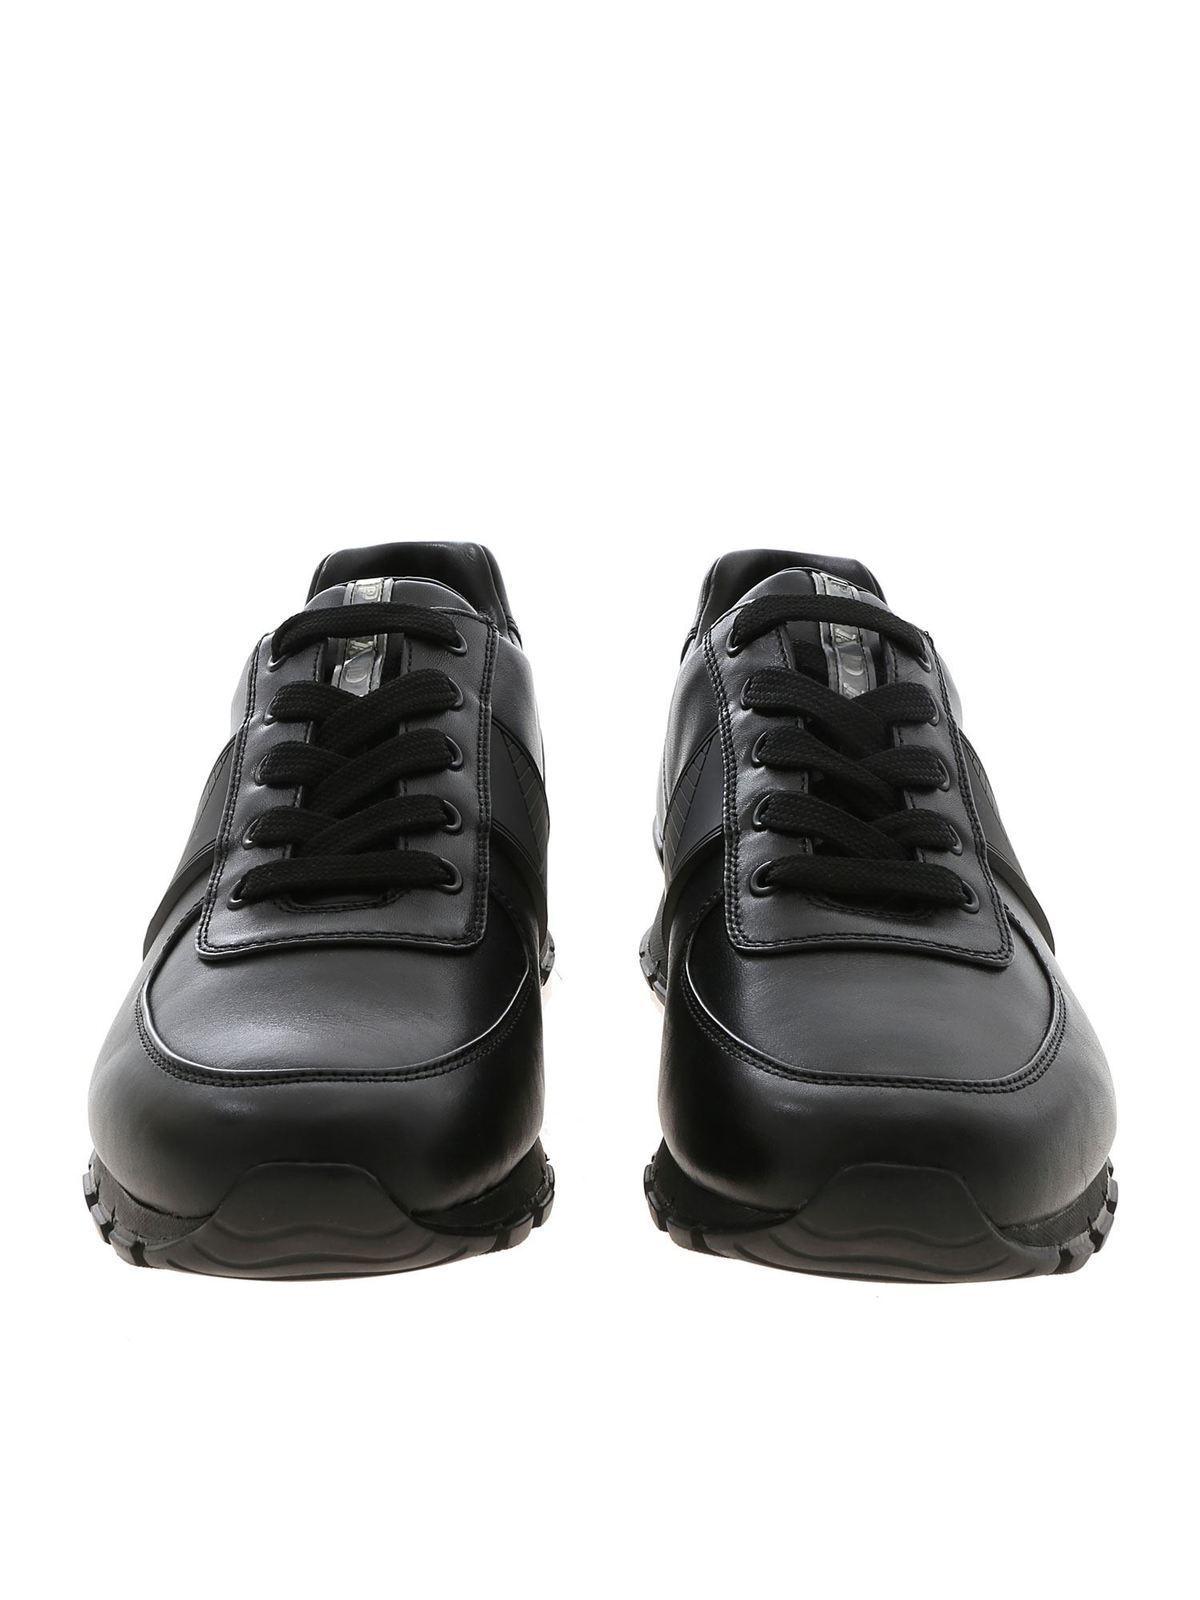 Prada Sport - Sneakers in black with